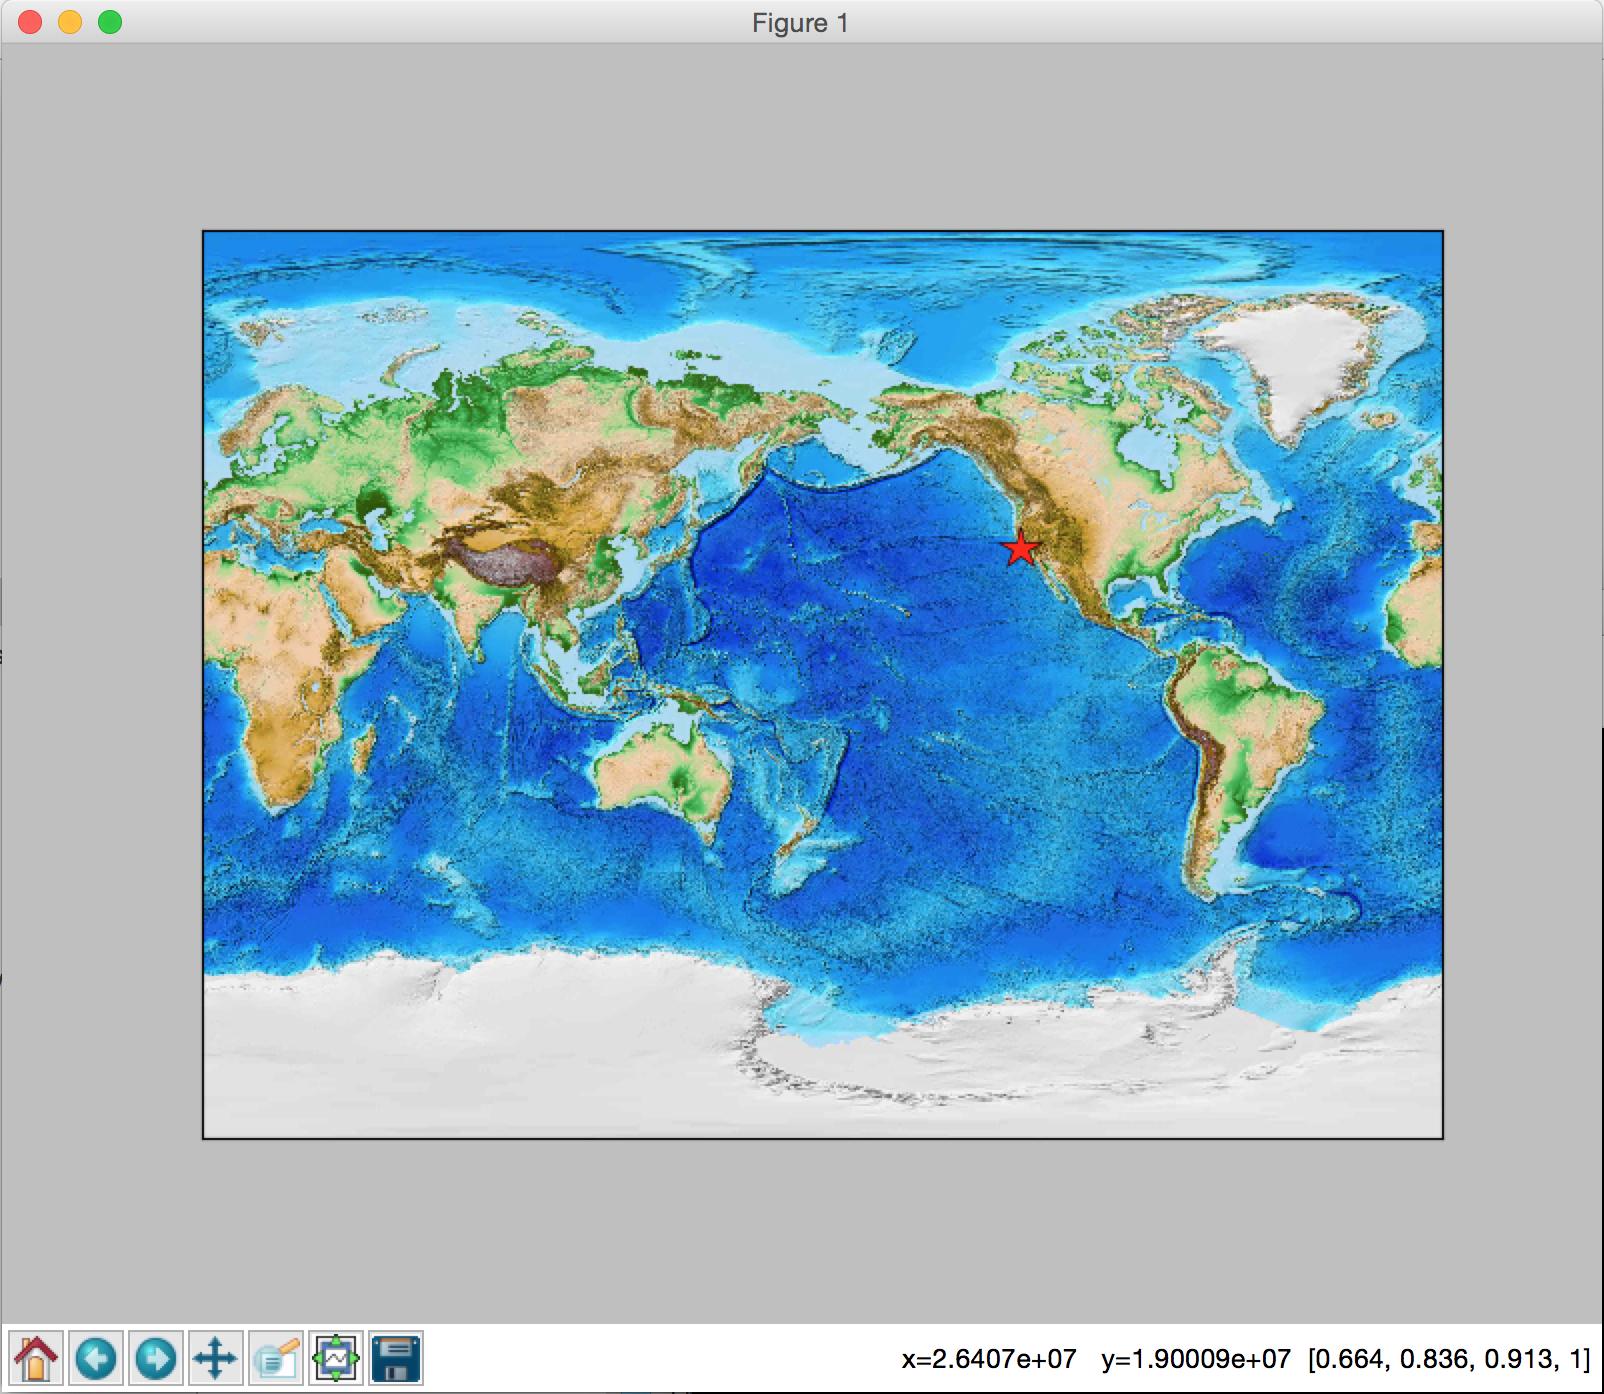 Qingkai's Blog: Python: Display Latitude/Longitude on Basemap when